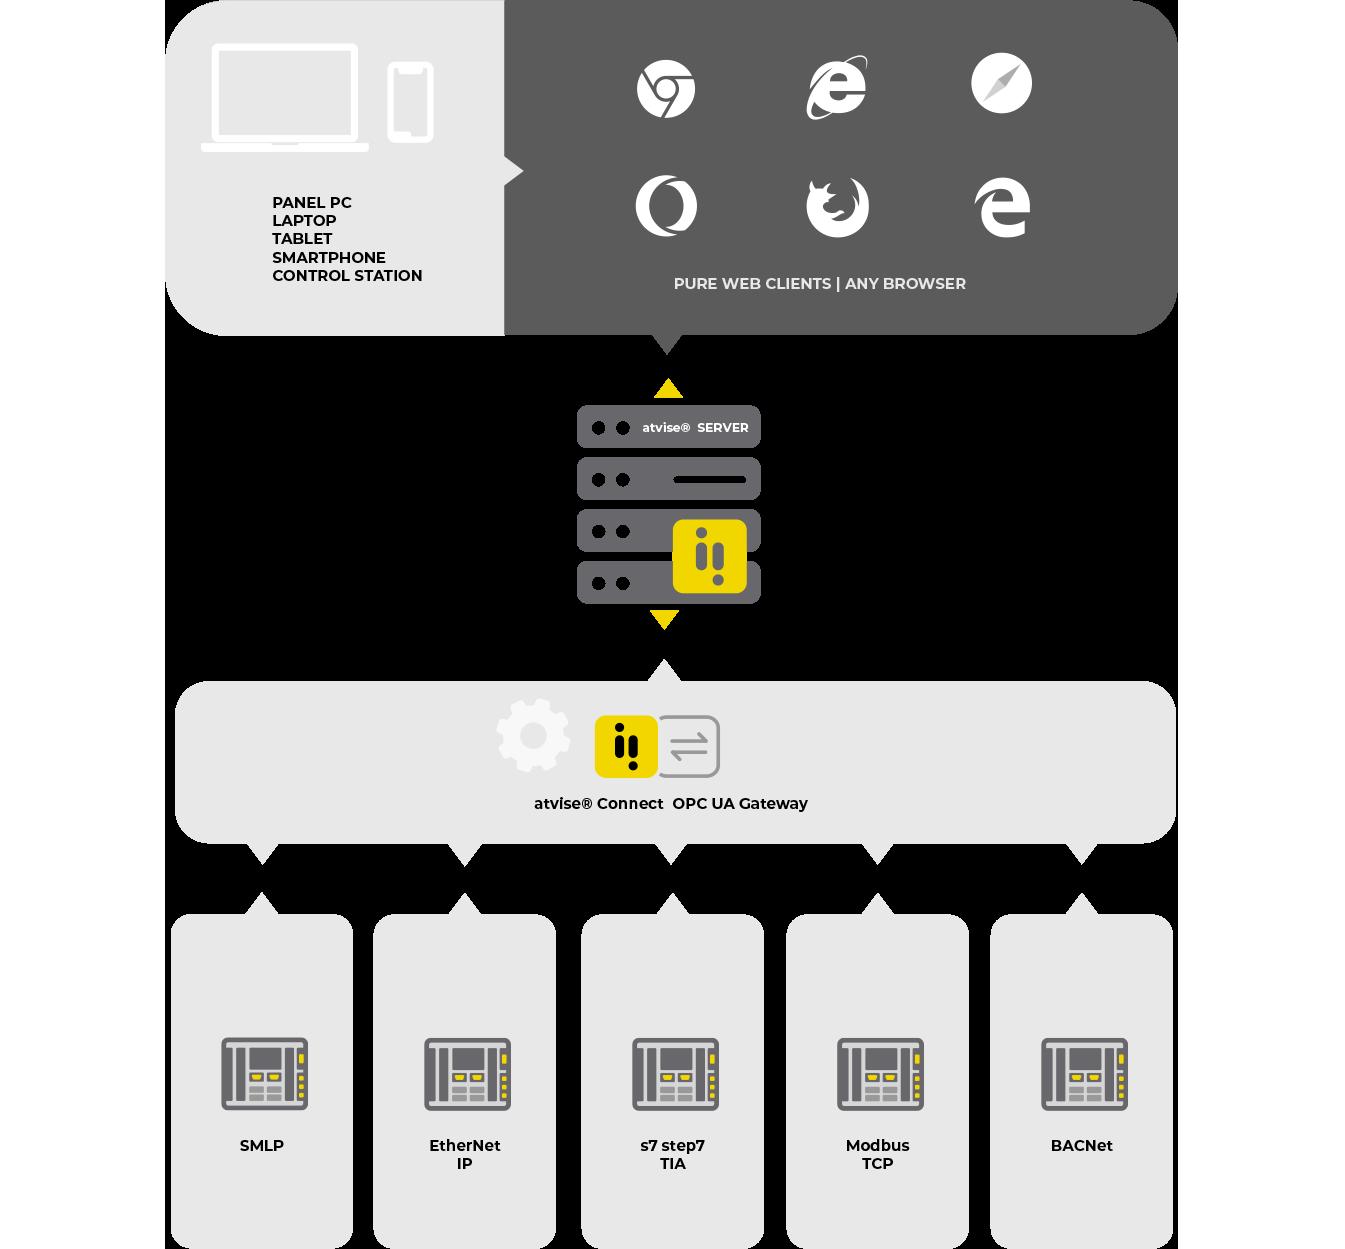 Add atvise® Connect OPC UA Gateway